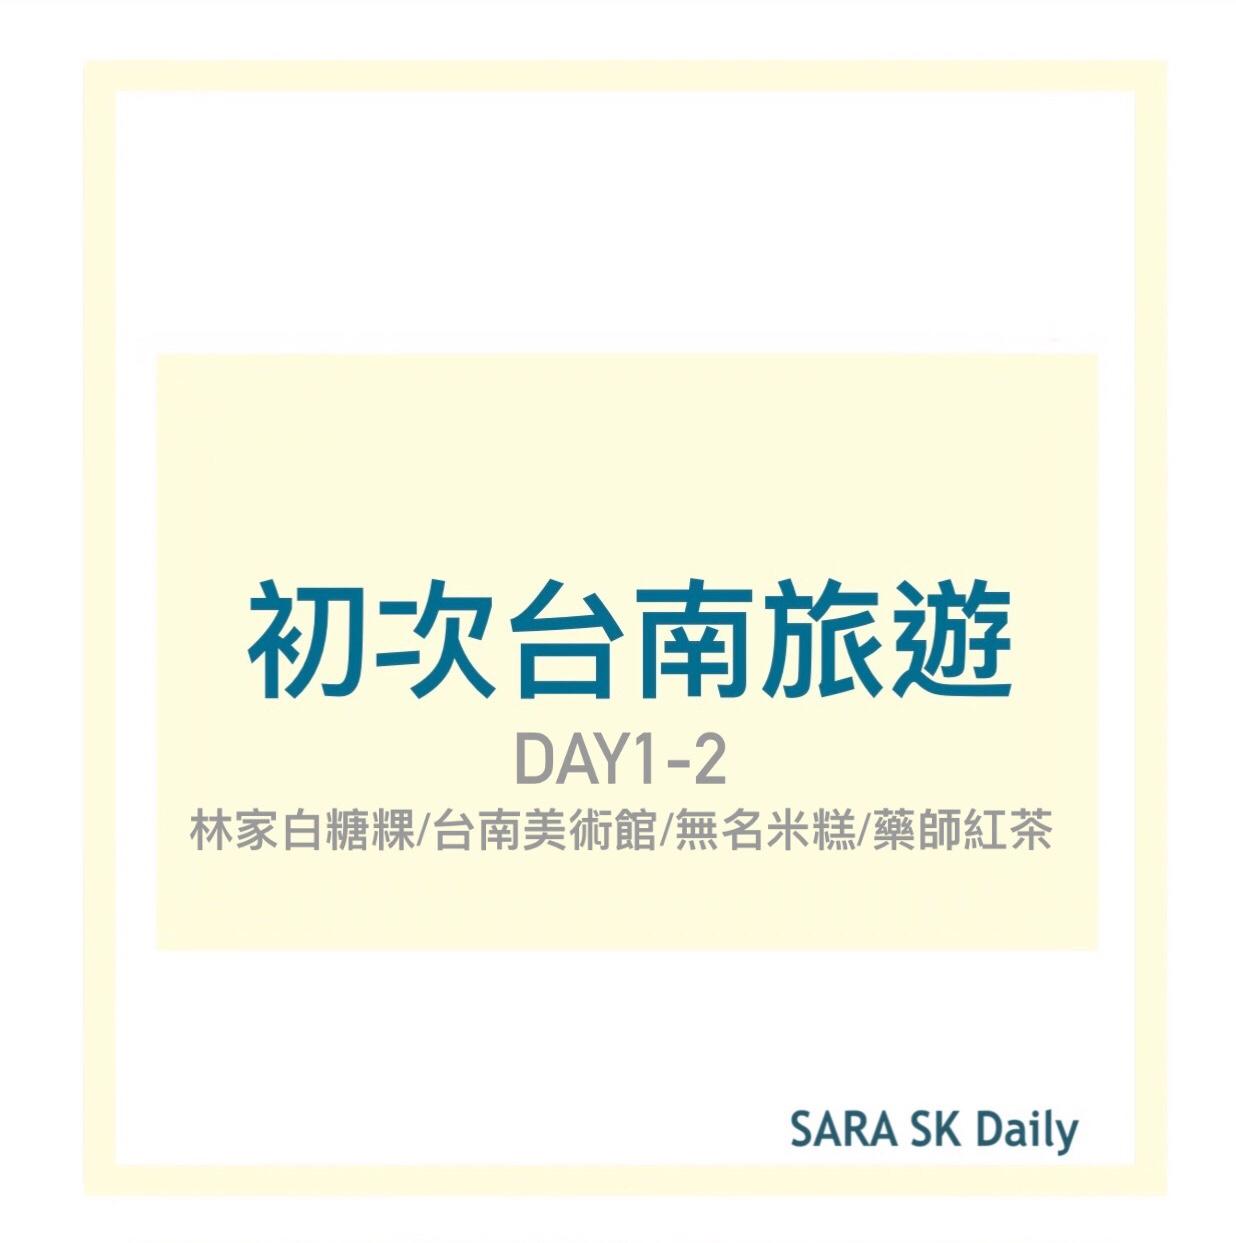 EP24 #旅遊筆記 ♡台南旅遊初體驗!DAY1-2